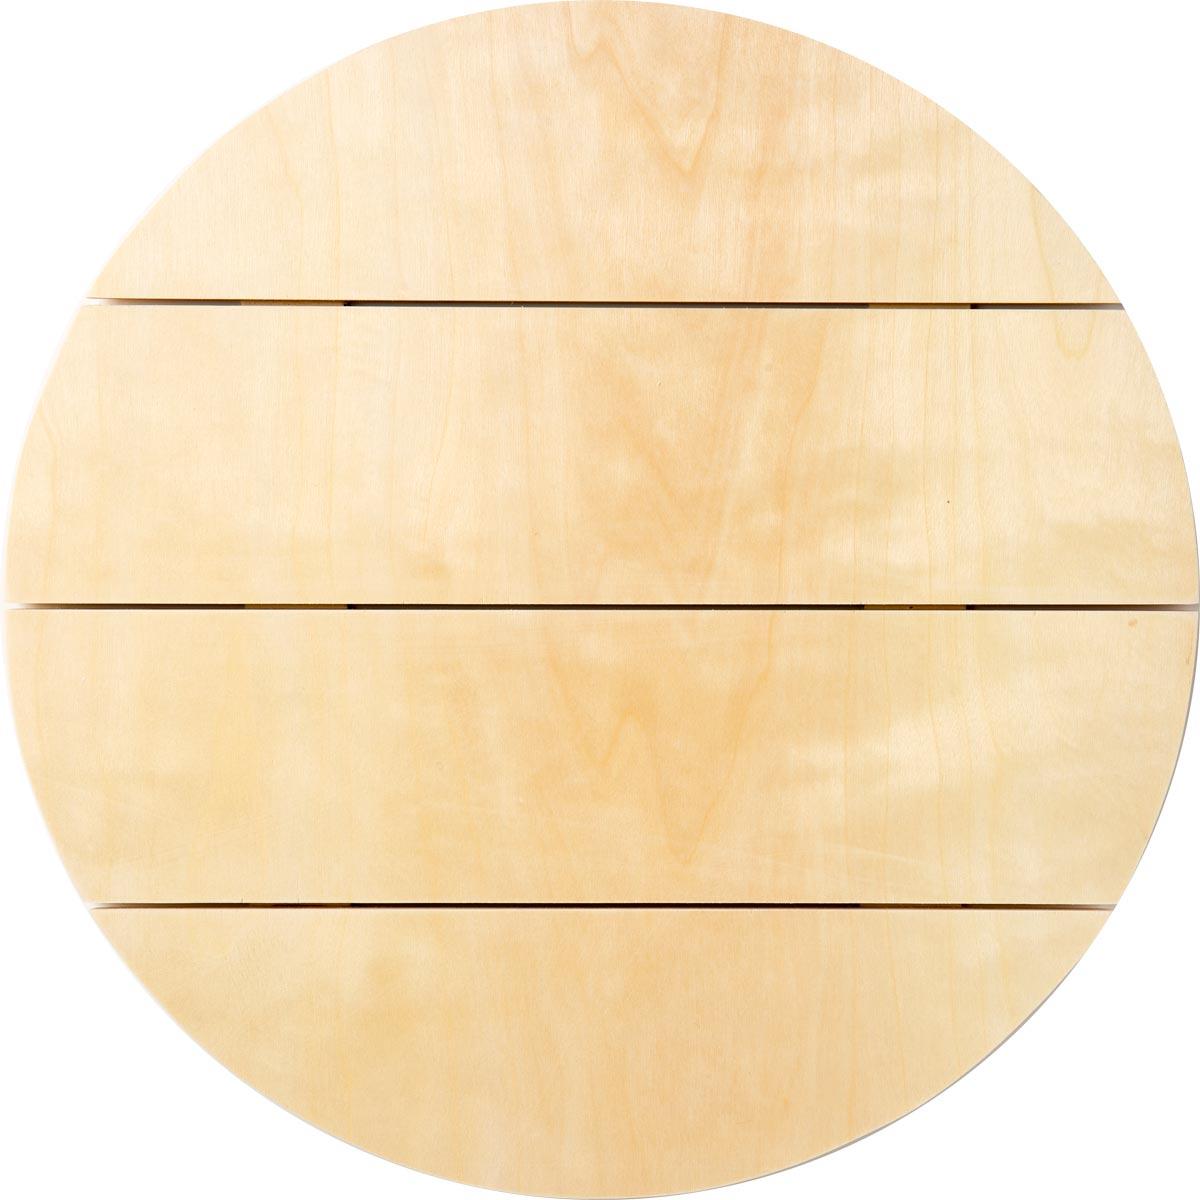 Plaid ® Wood Surfaces - Pallet Circle, 12